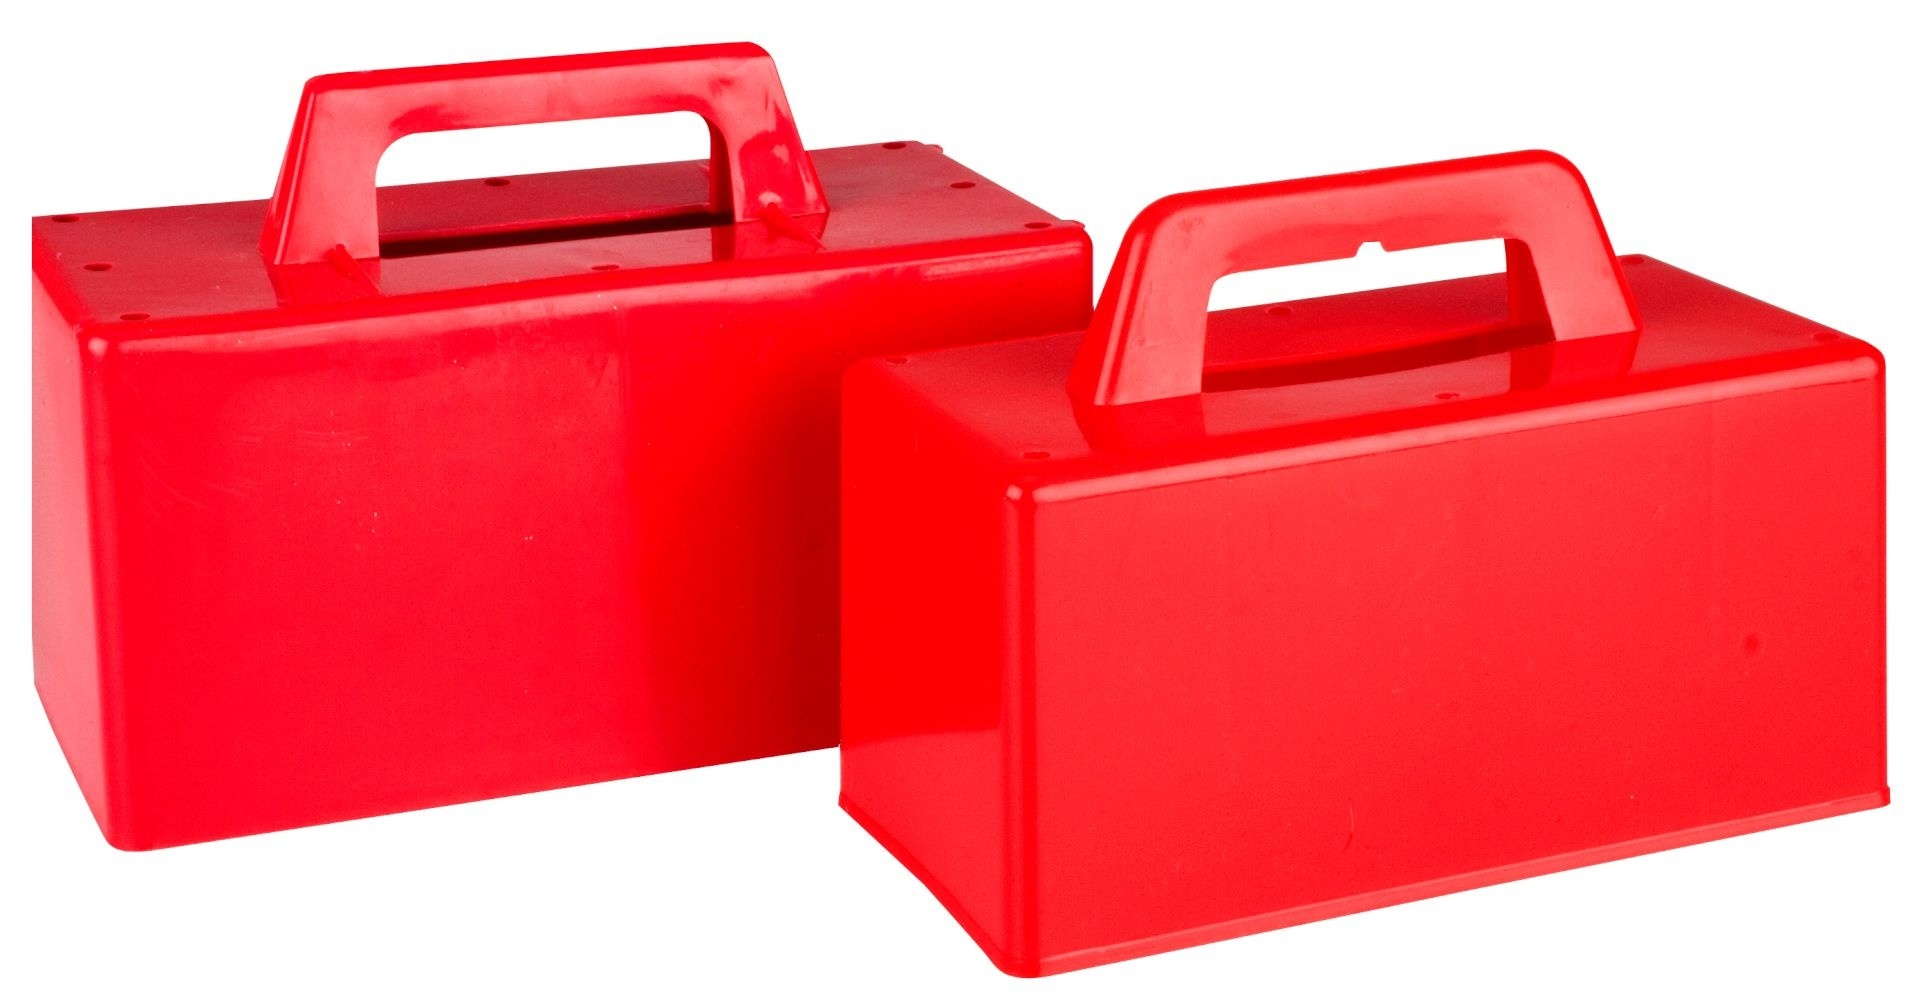 Schreuders Sport Zandkasteel/Iglomaker rood 2 stuks